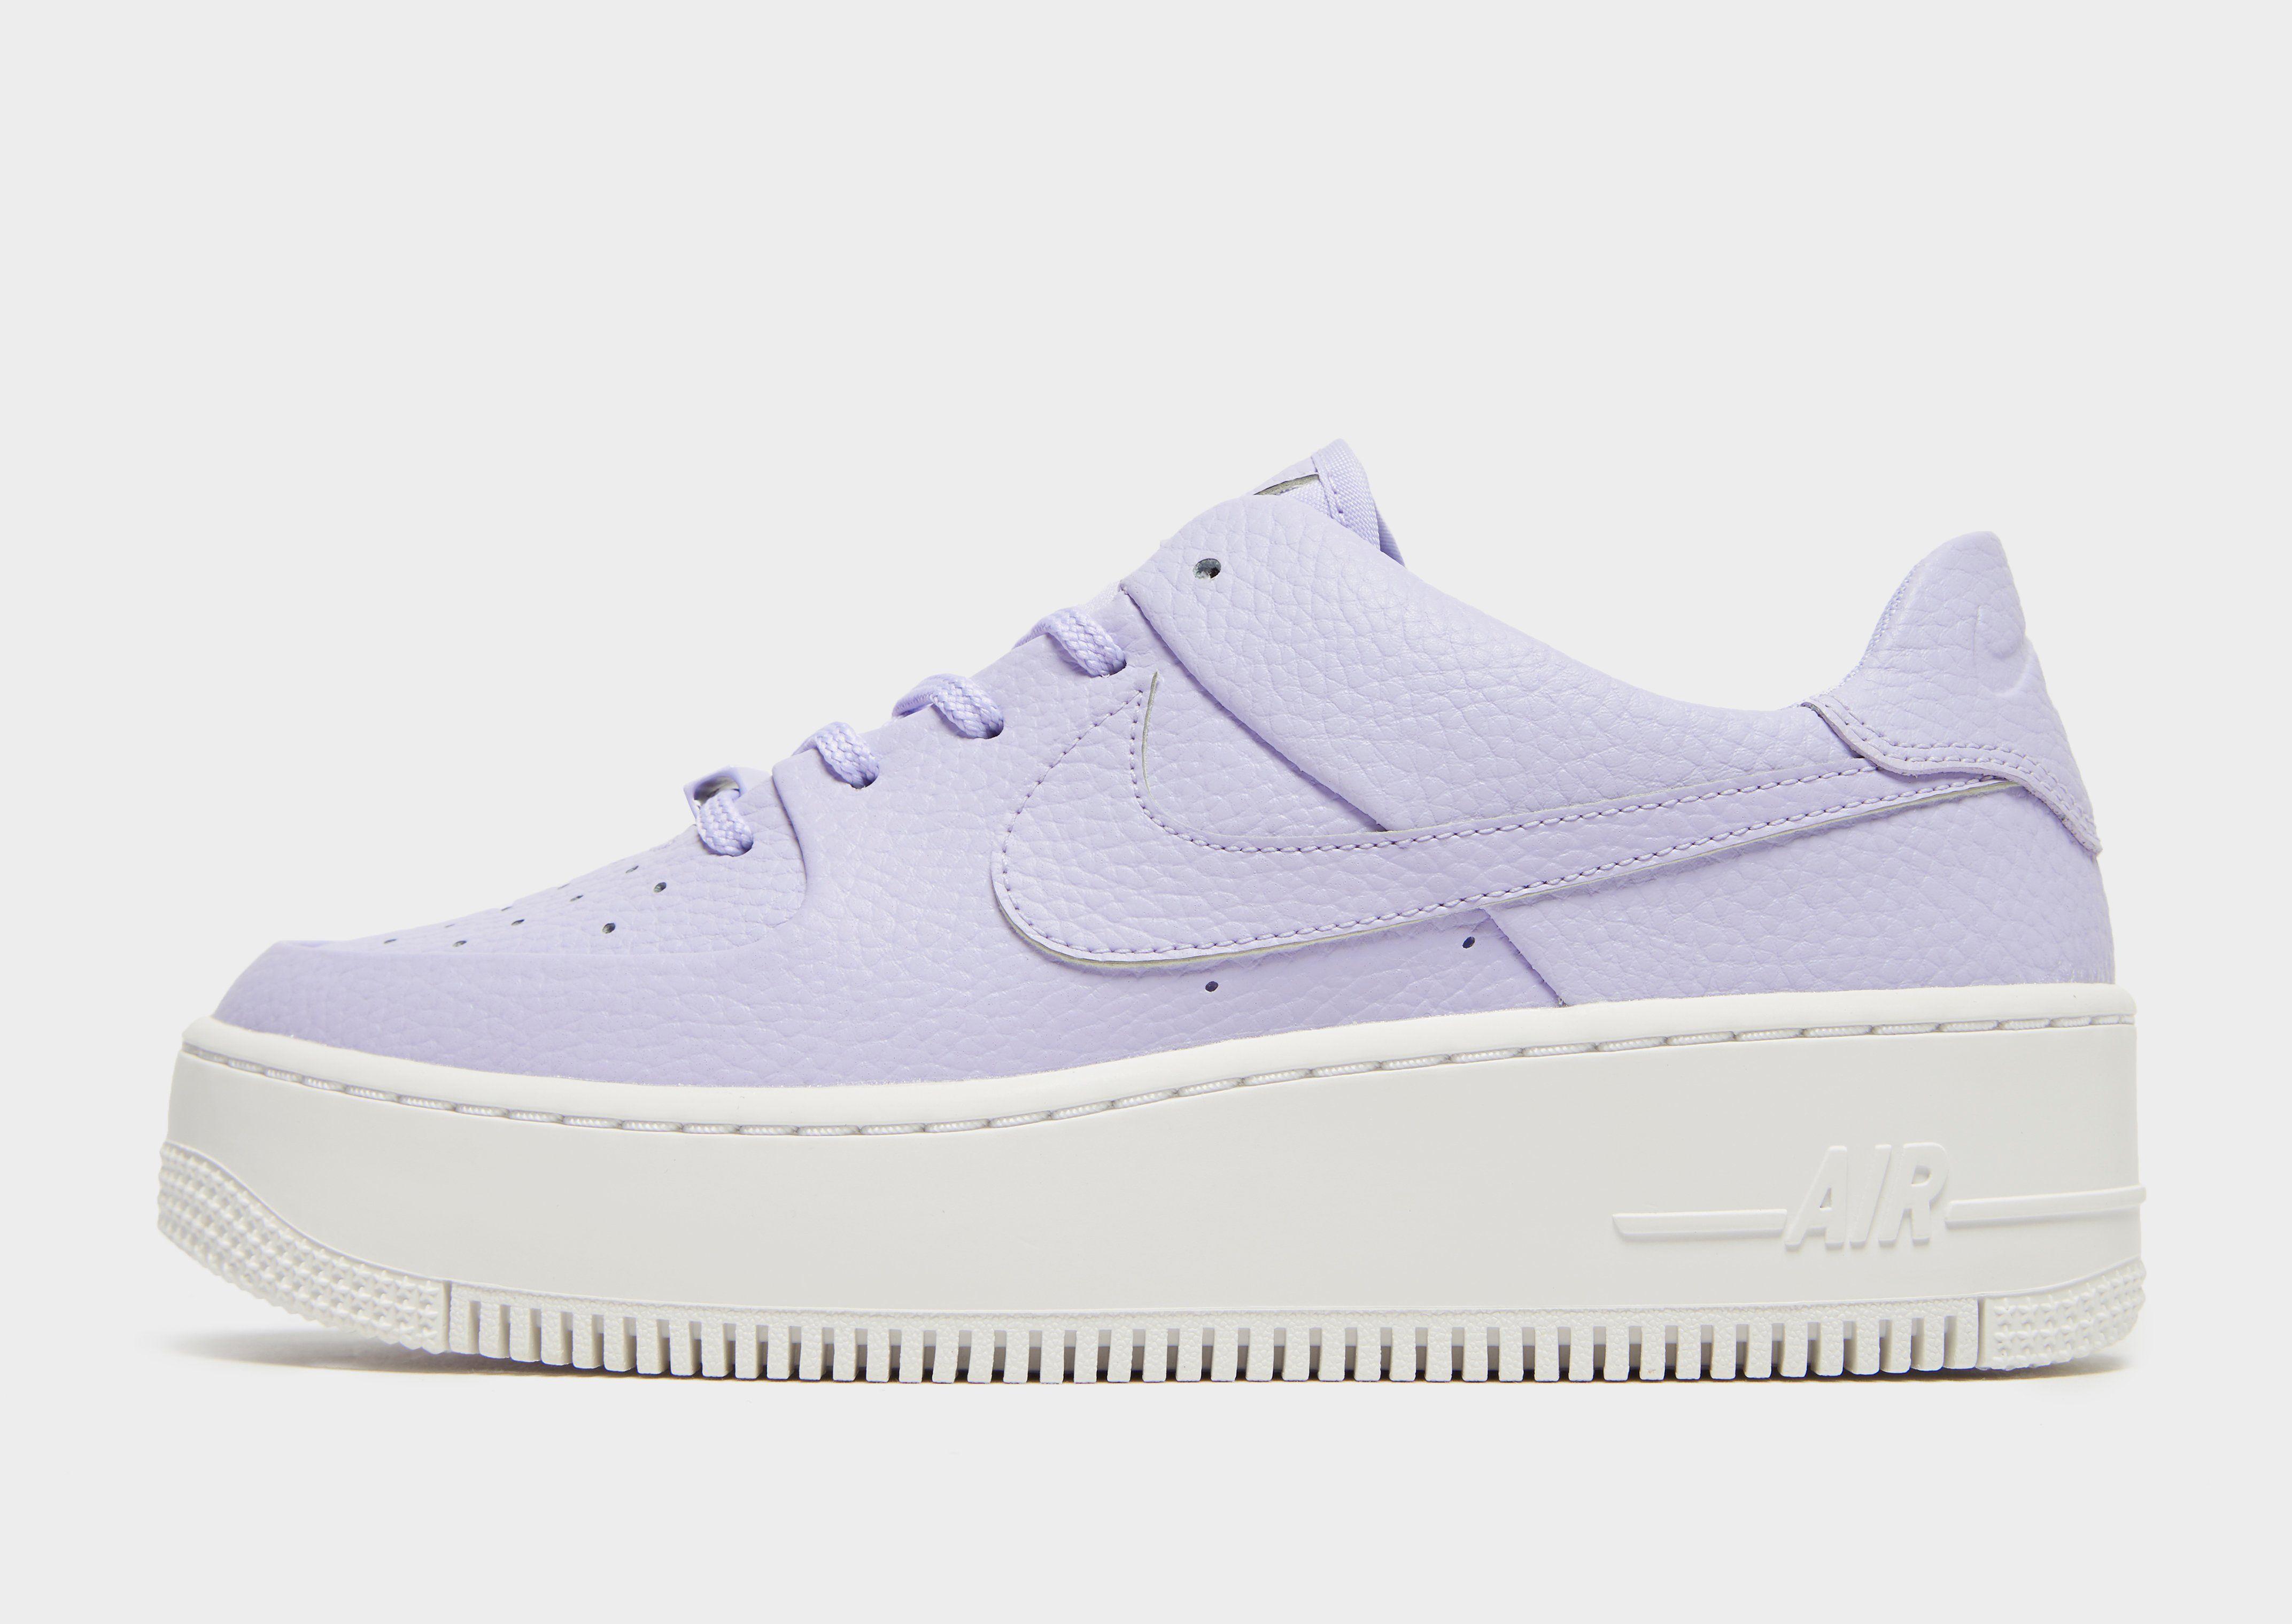 online store d42b1 baf9c Nike Air Force 1 Sage Low Women s